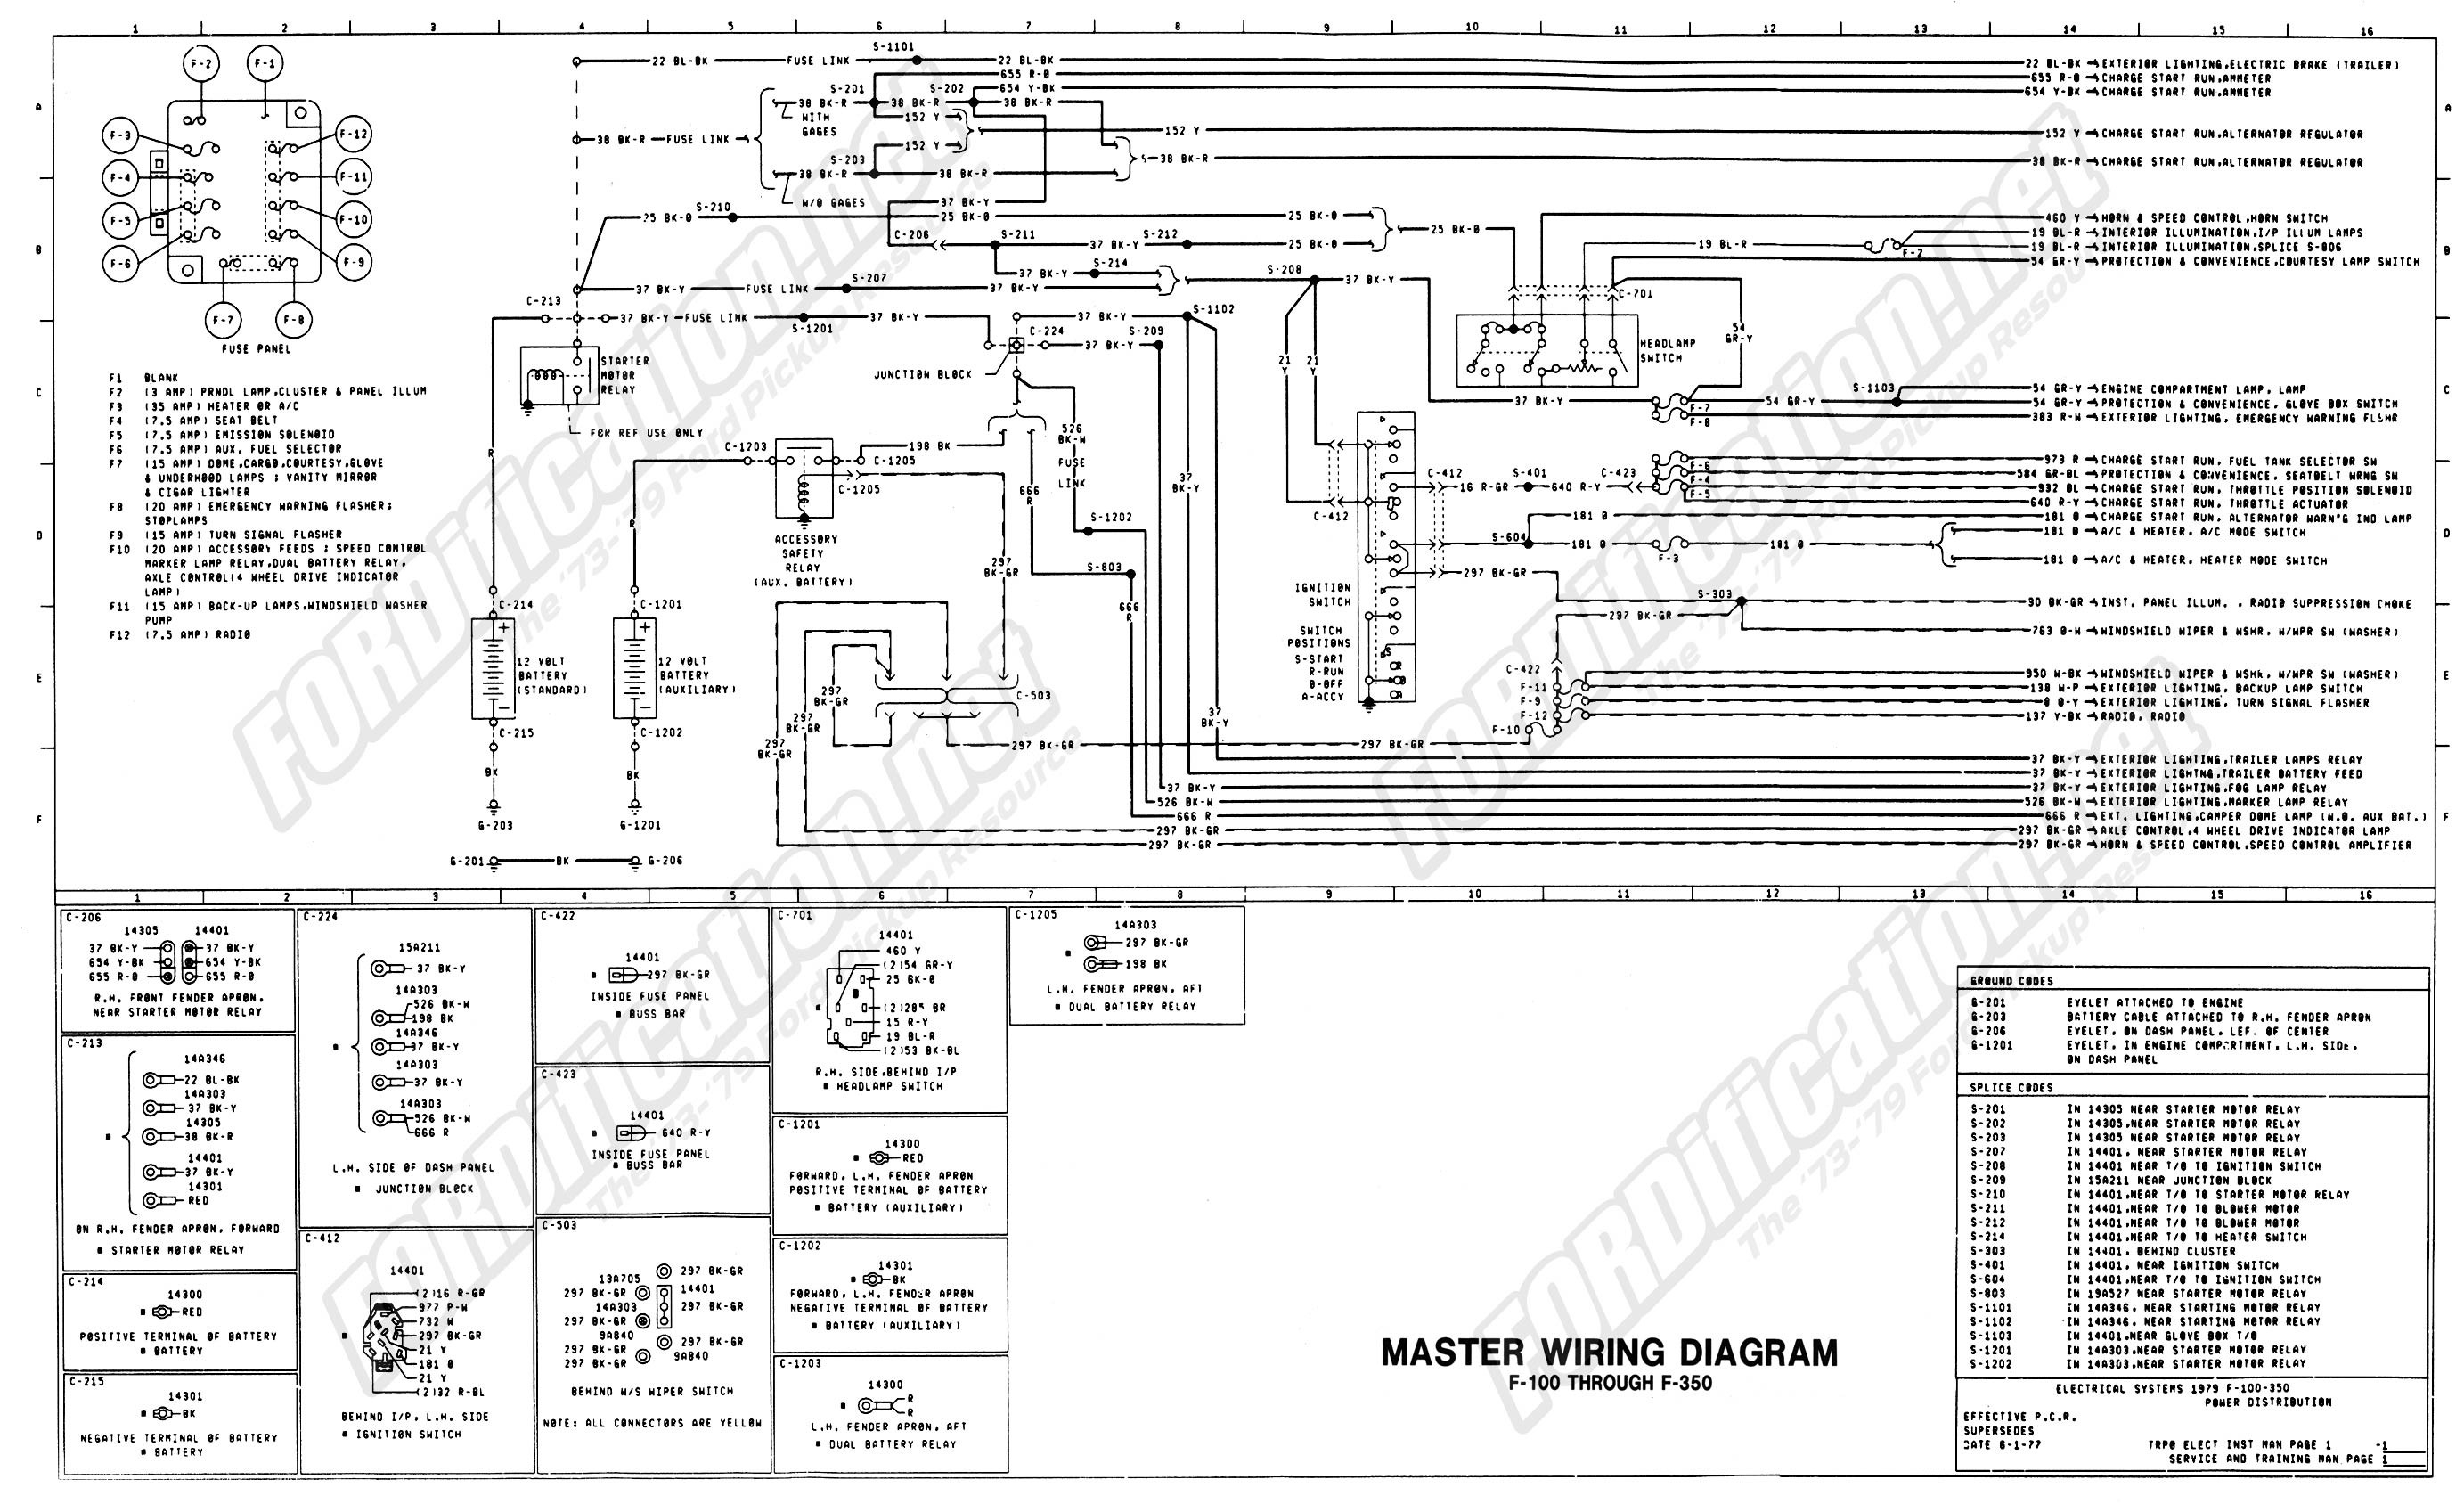 82 f150 wiring diagram